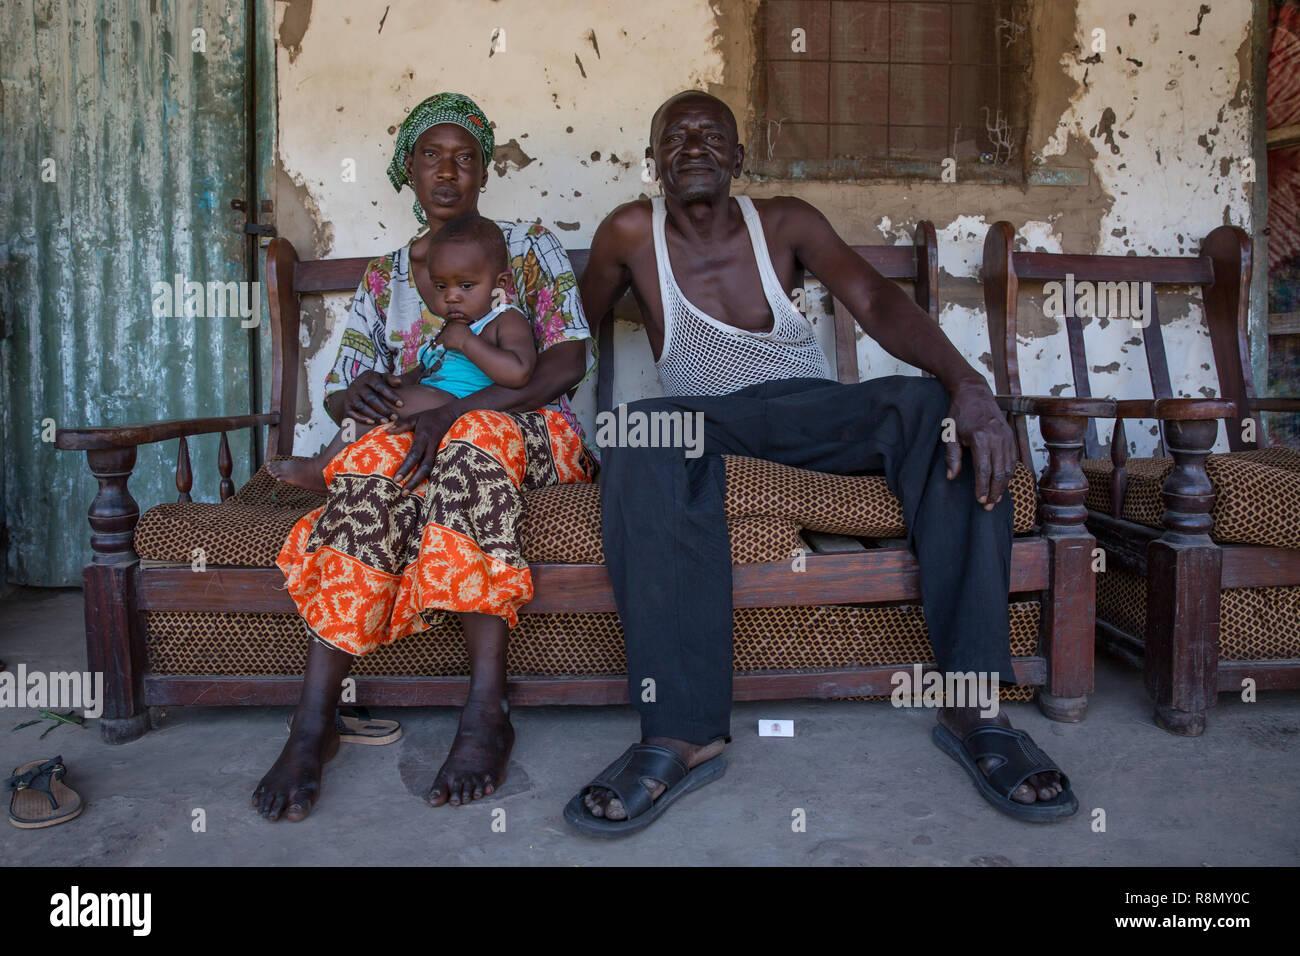 Yahya Jammeh Stock Photos & Yahya Jammeh Stock Images - Alamy